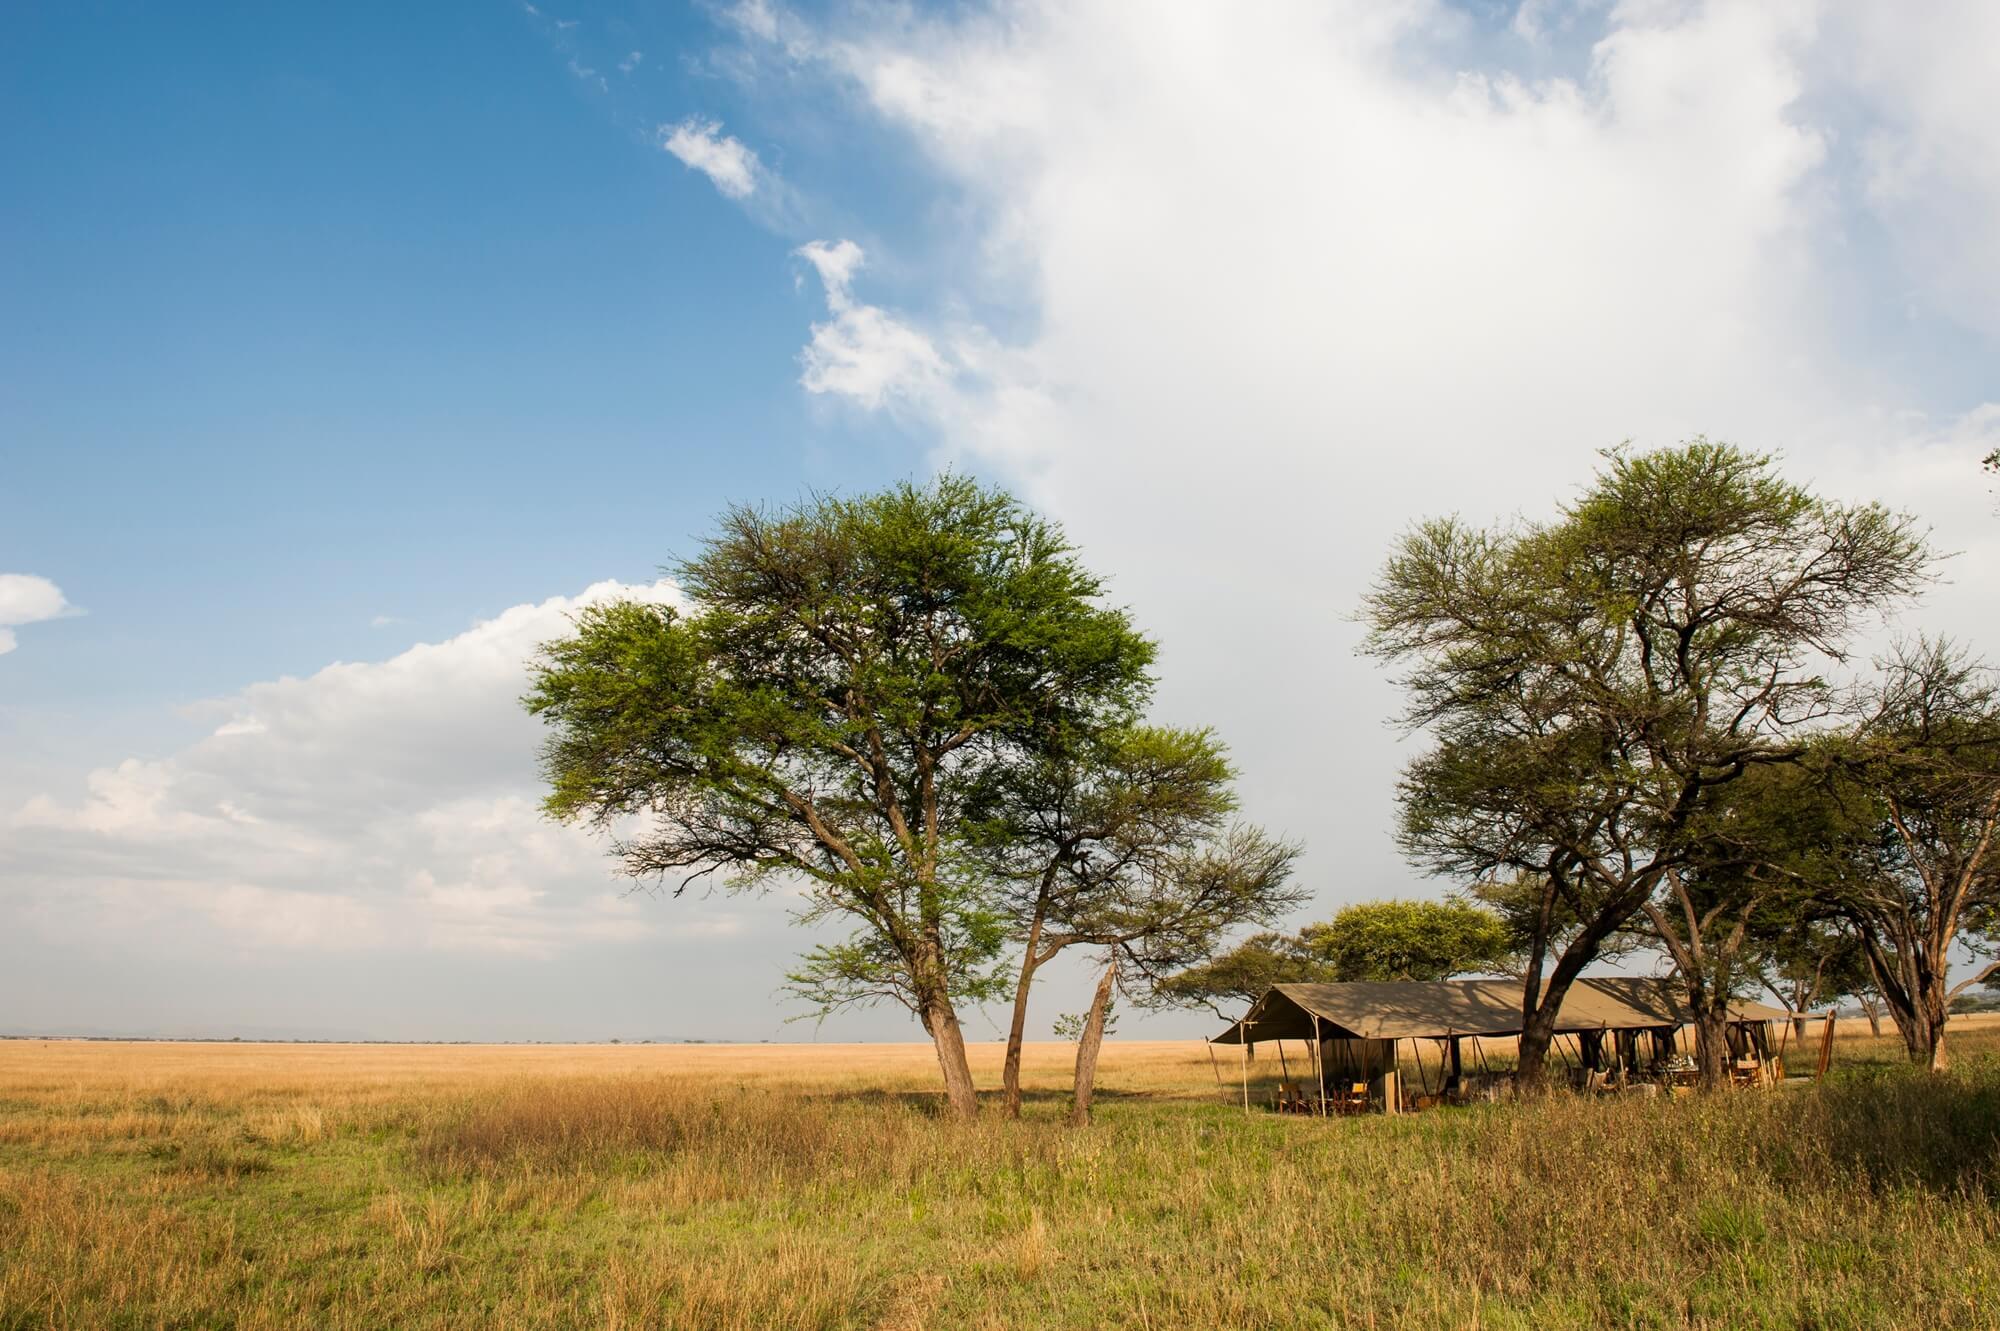 Nomad's Serengeti Safari Camp